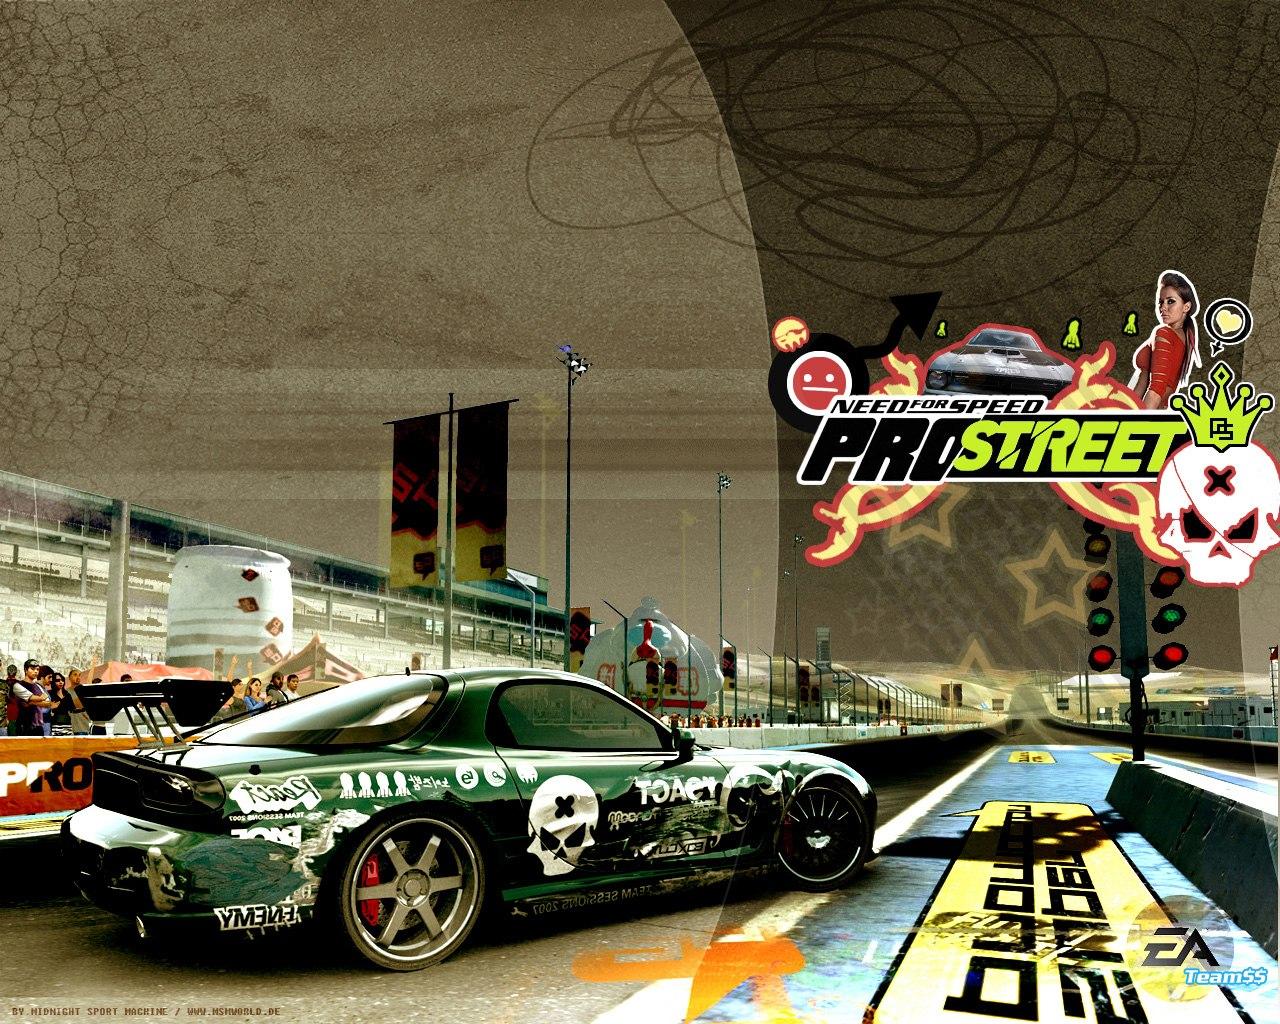 http://3.bp.blogspot.com/-ena0YsaaK7Q/TpNOOS5FsqI/AAAAAAAAQFA/BFzd-au2iaA/s1600/NFS+Car+Wallpapers.jpeg